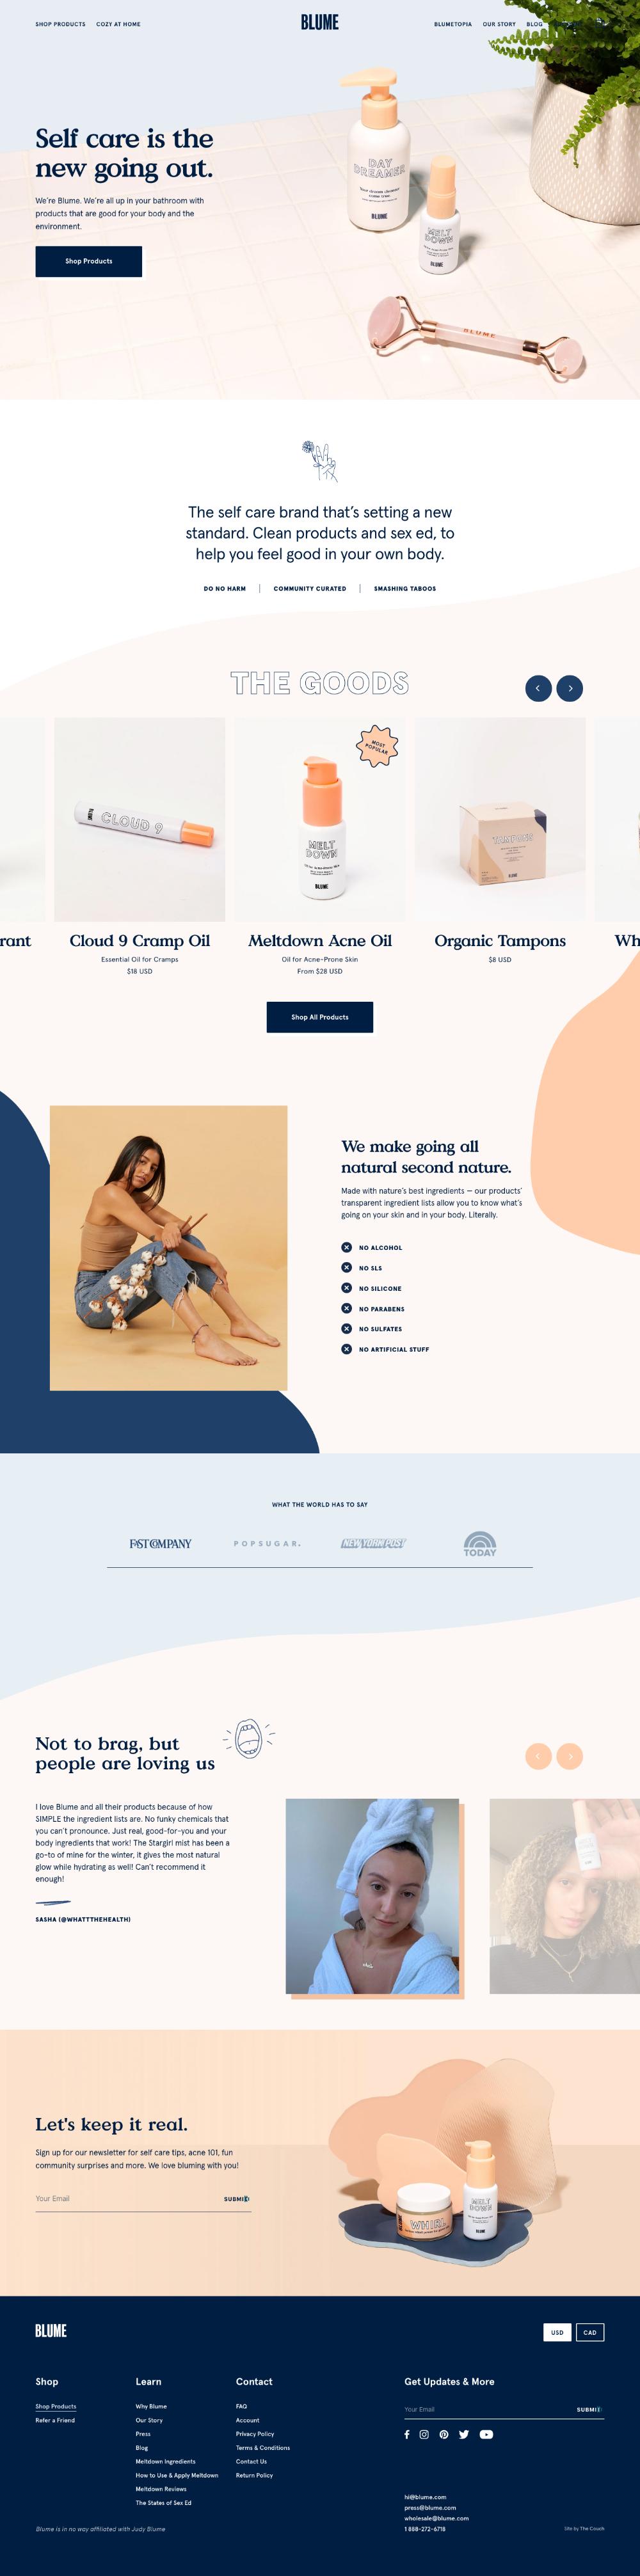 Photo of Blume landing page design inspiration – Lapa Ninja